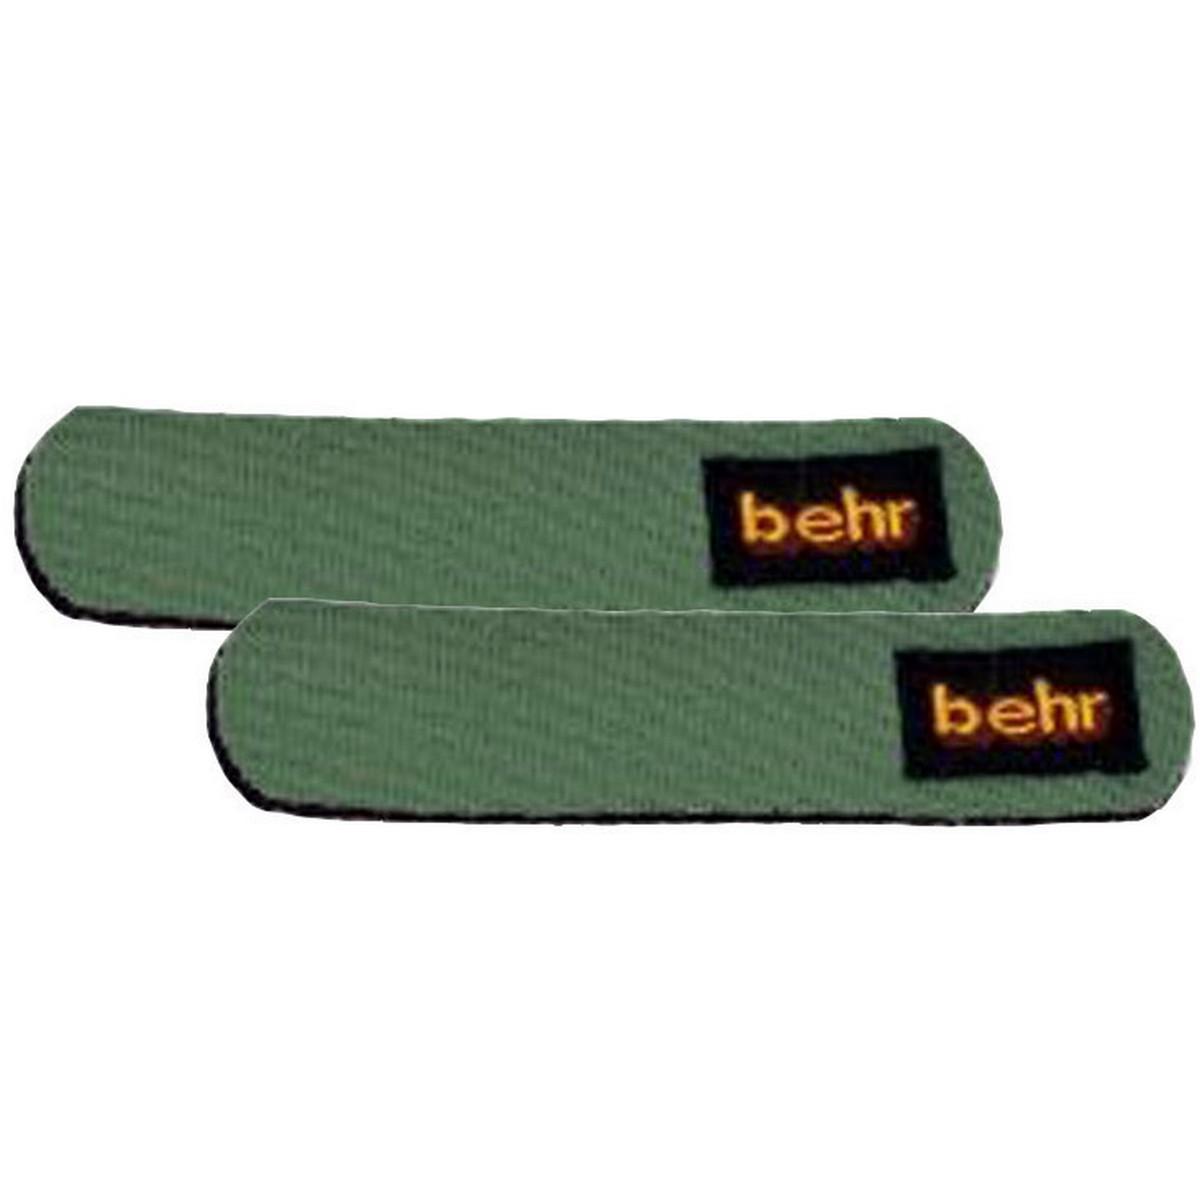 Неопренови велкро ленти за пръчки Behr 21 см